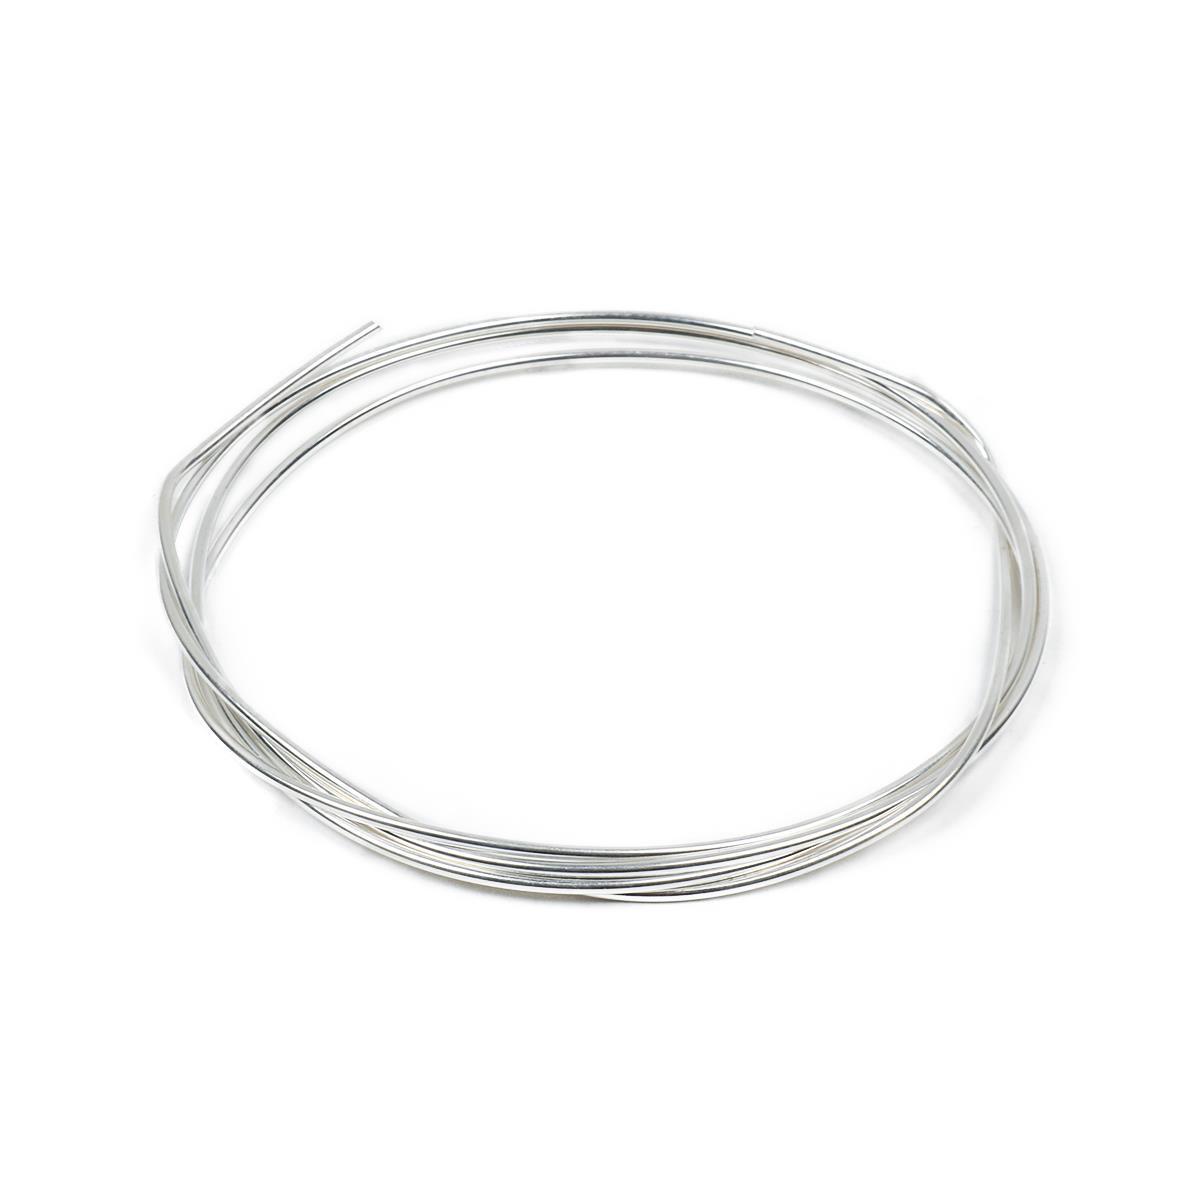 1m 925 Sterling Silver Wire - 1.5mm (18g) | JewelleryMaker.com